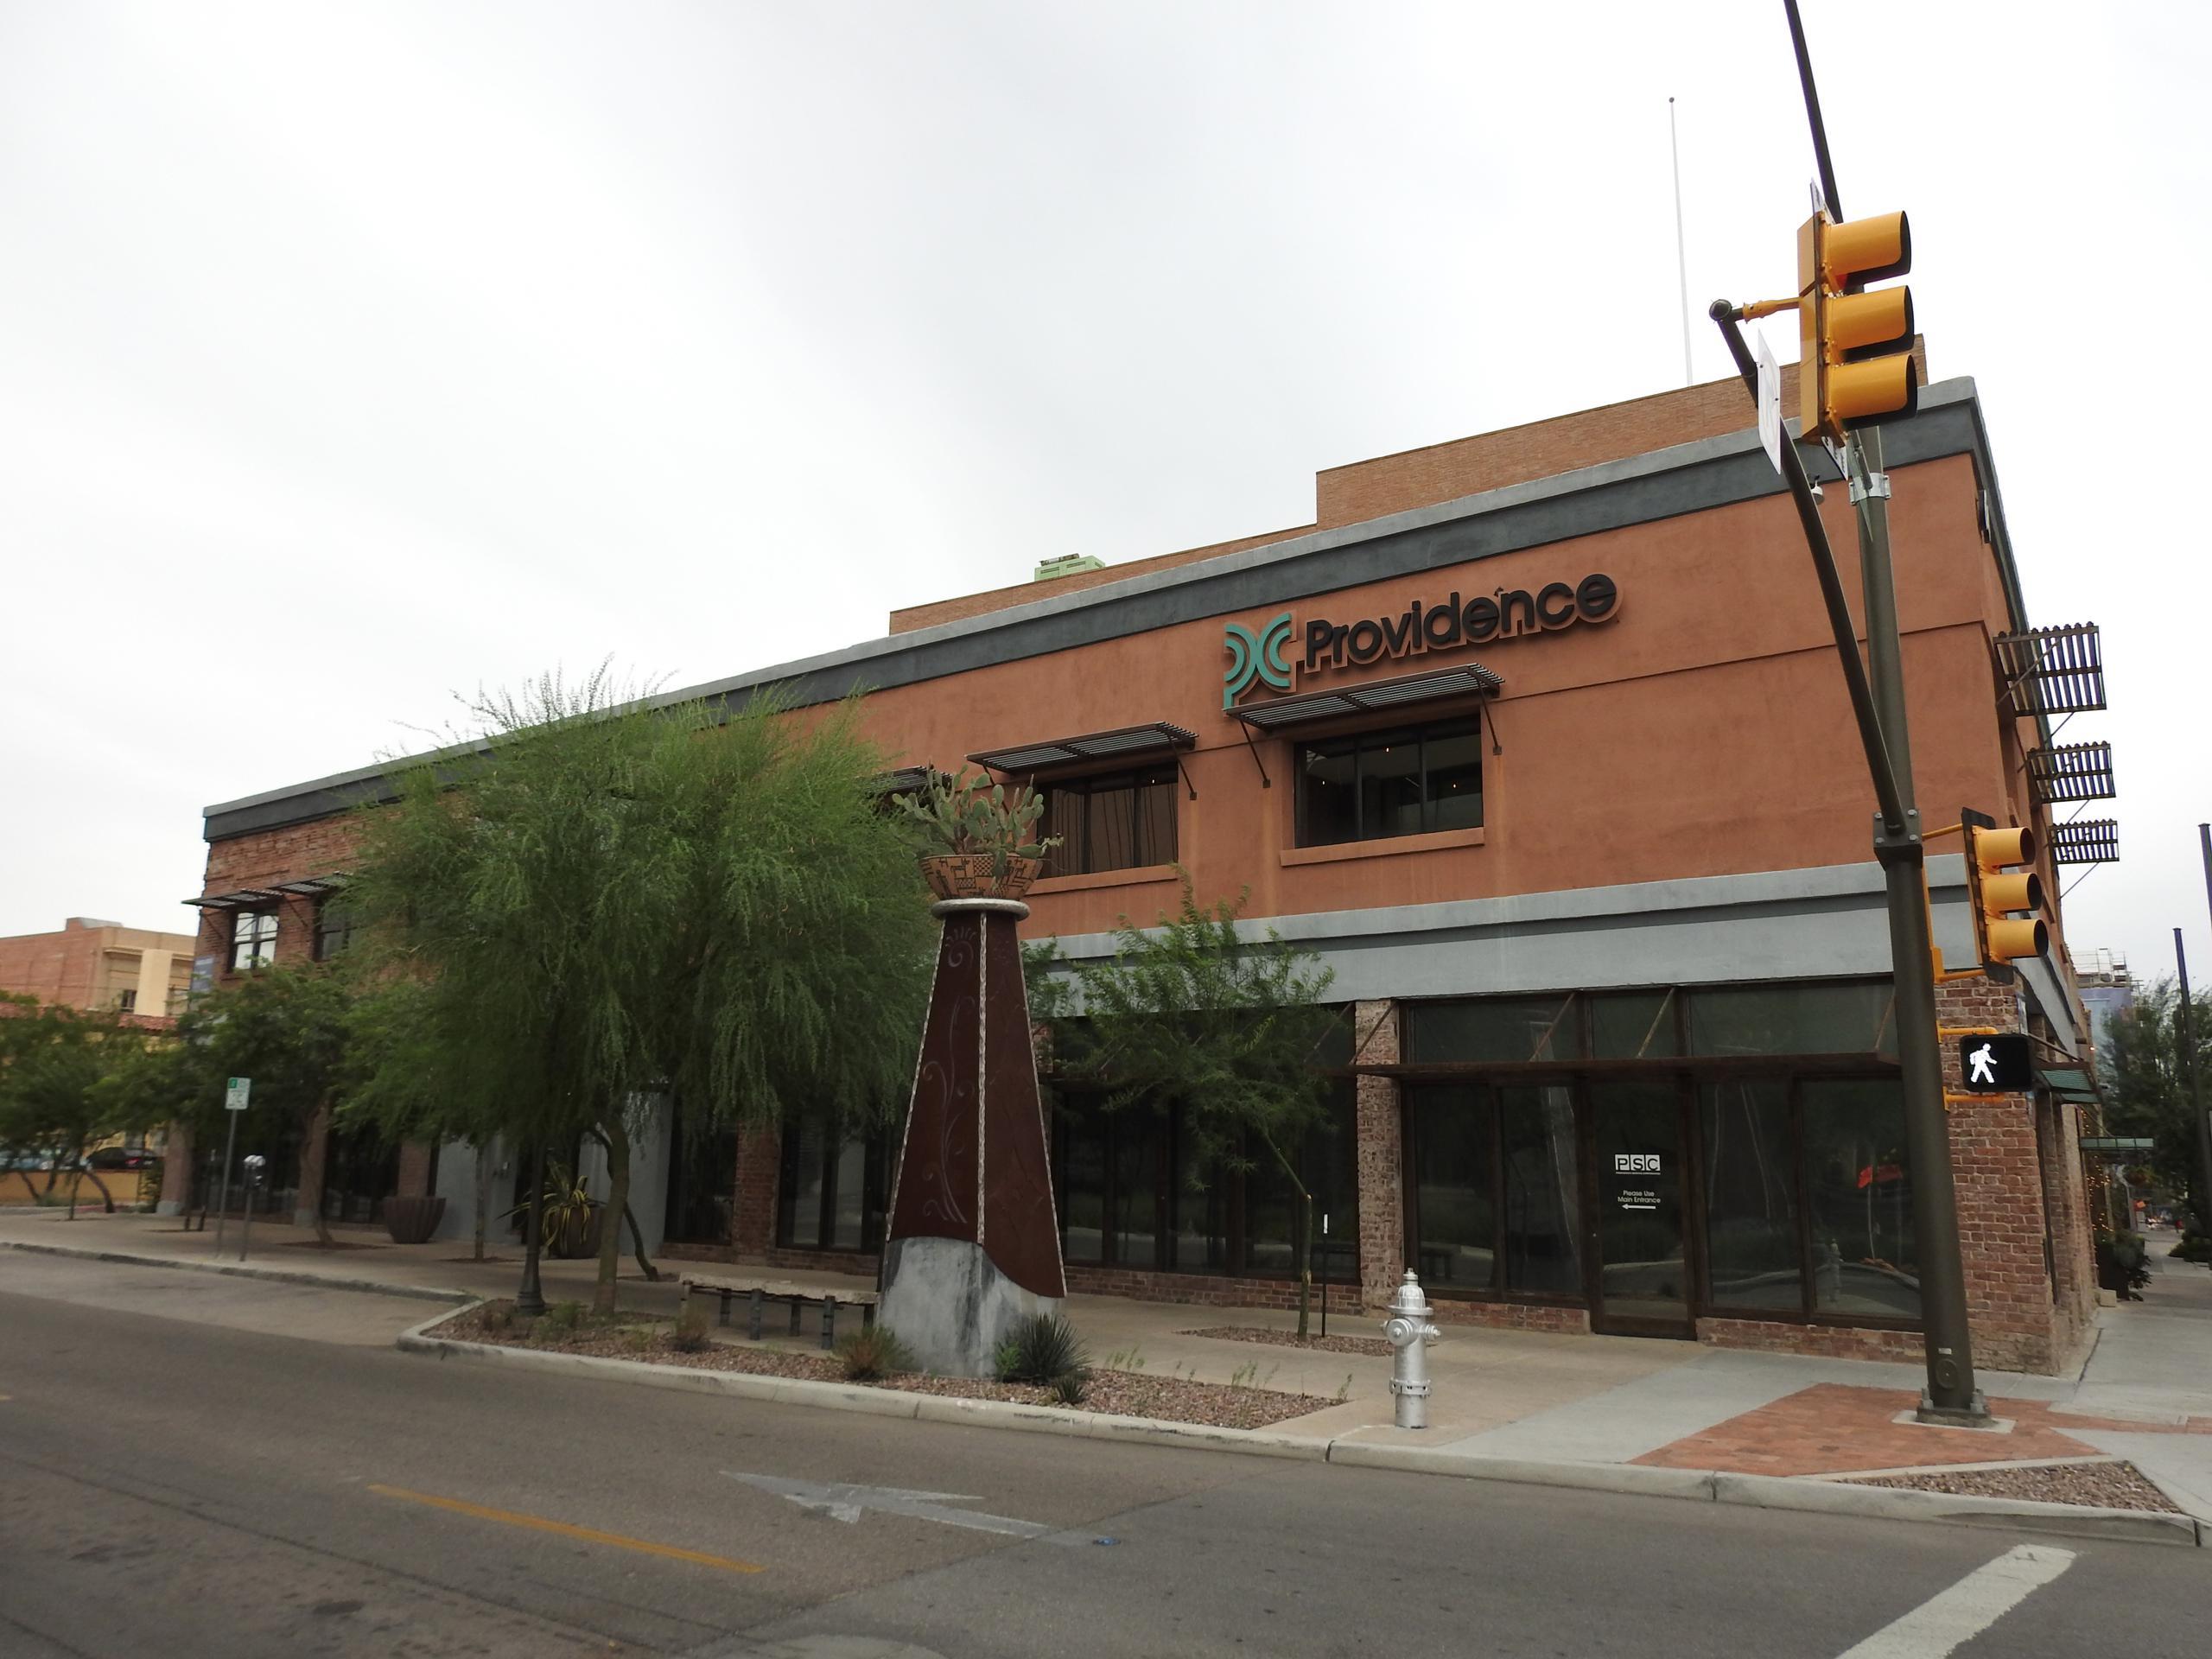 Providence Service's corporate headquarters in Tucson, Arizona.